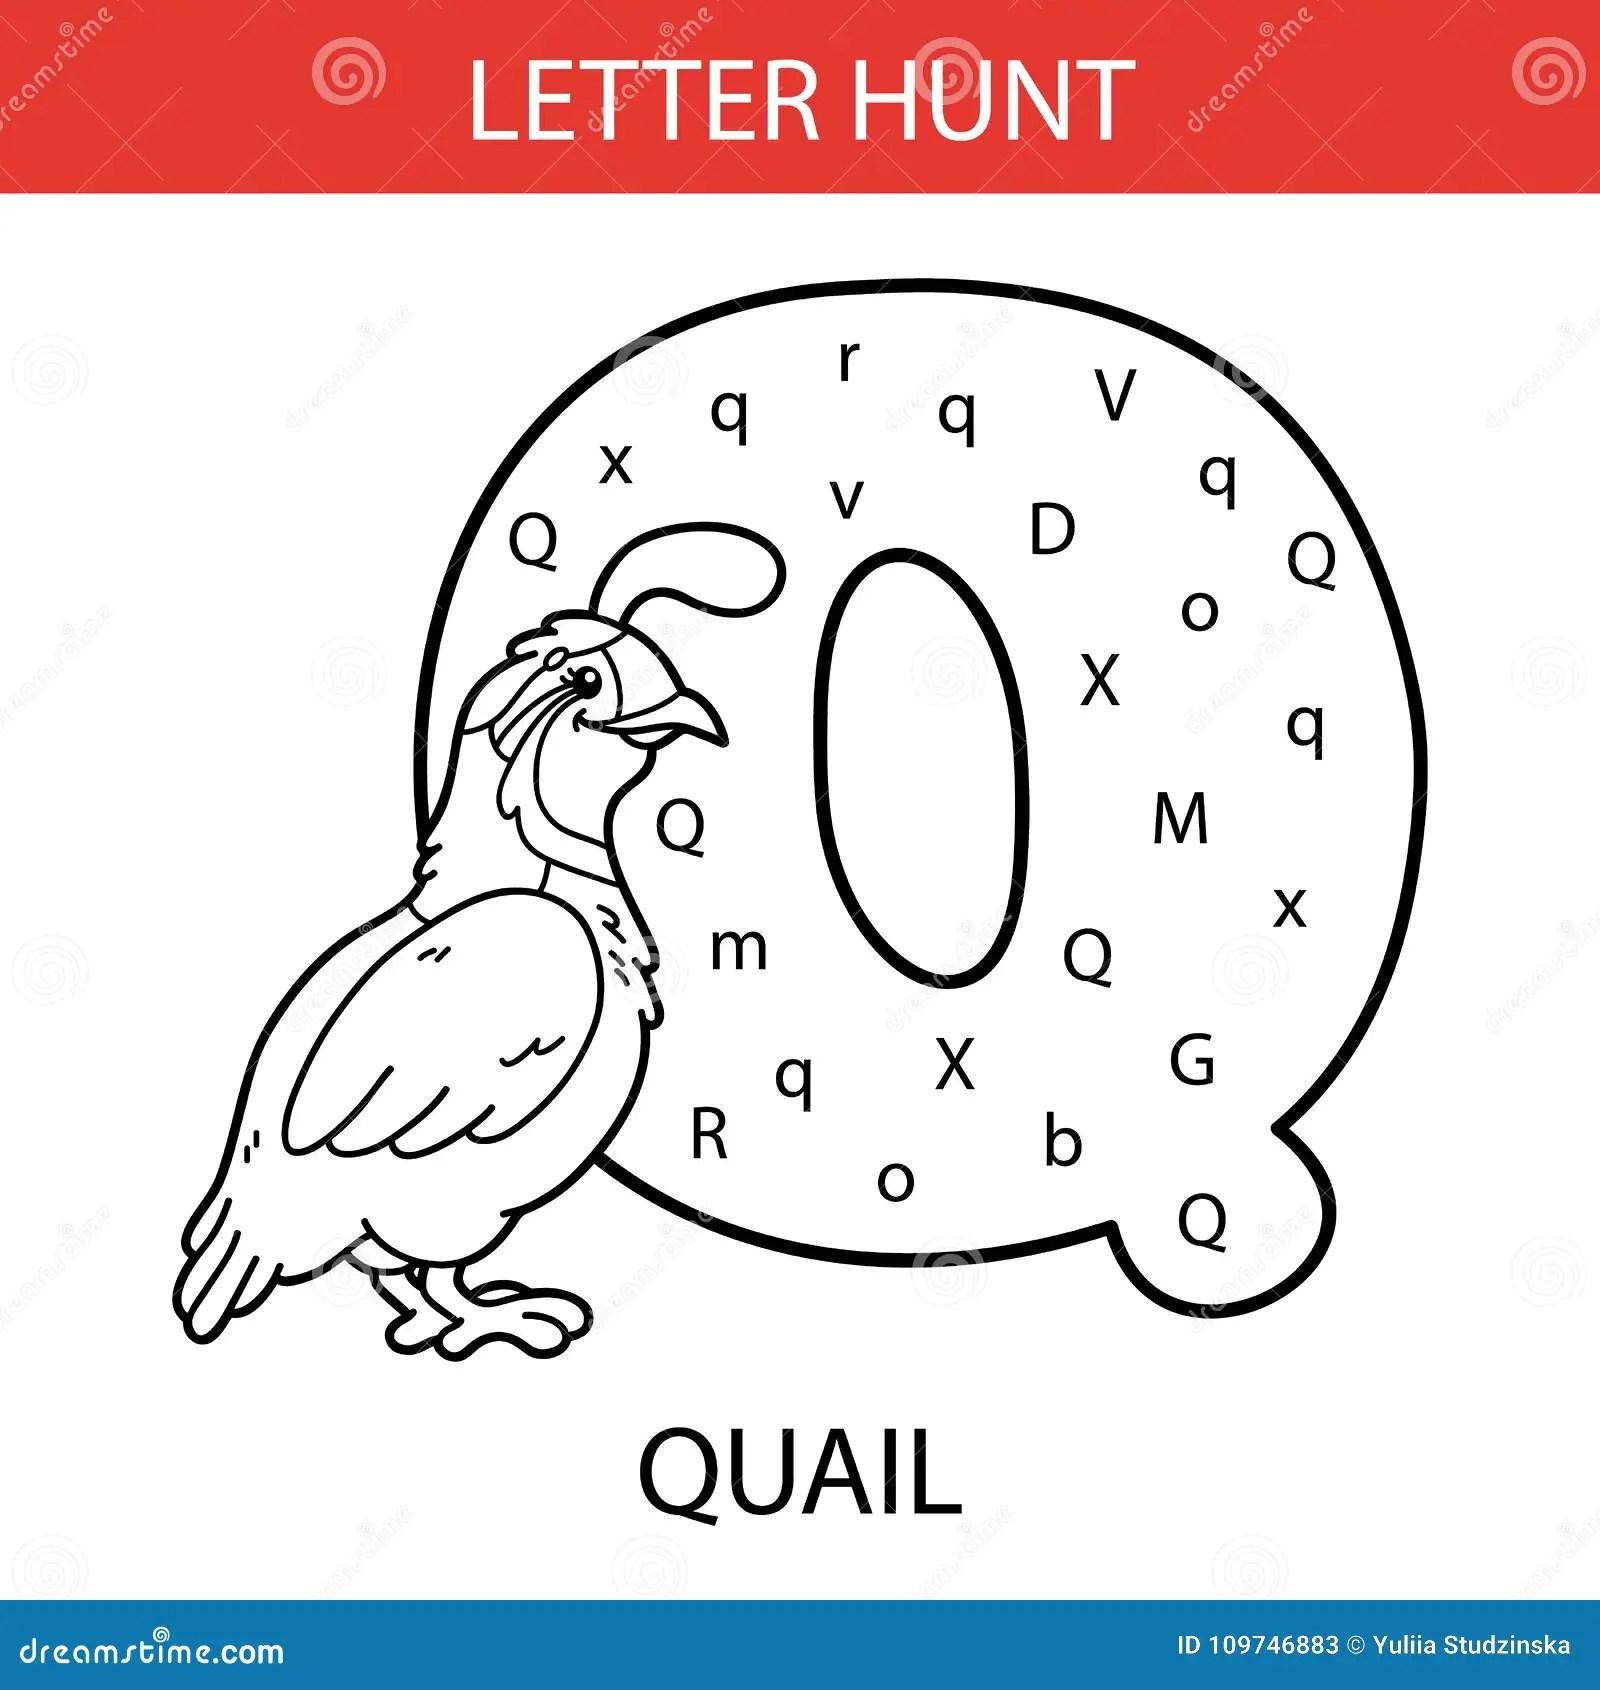 Animal Letter Hunt Quail Stock Vector Illustration Of Digital